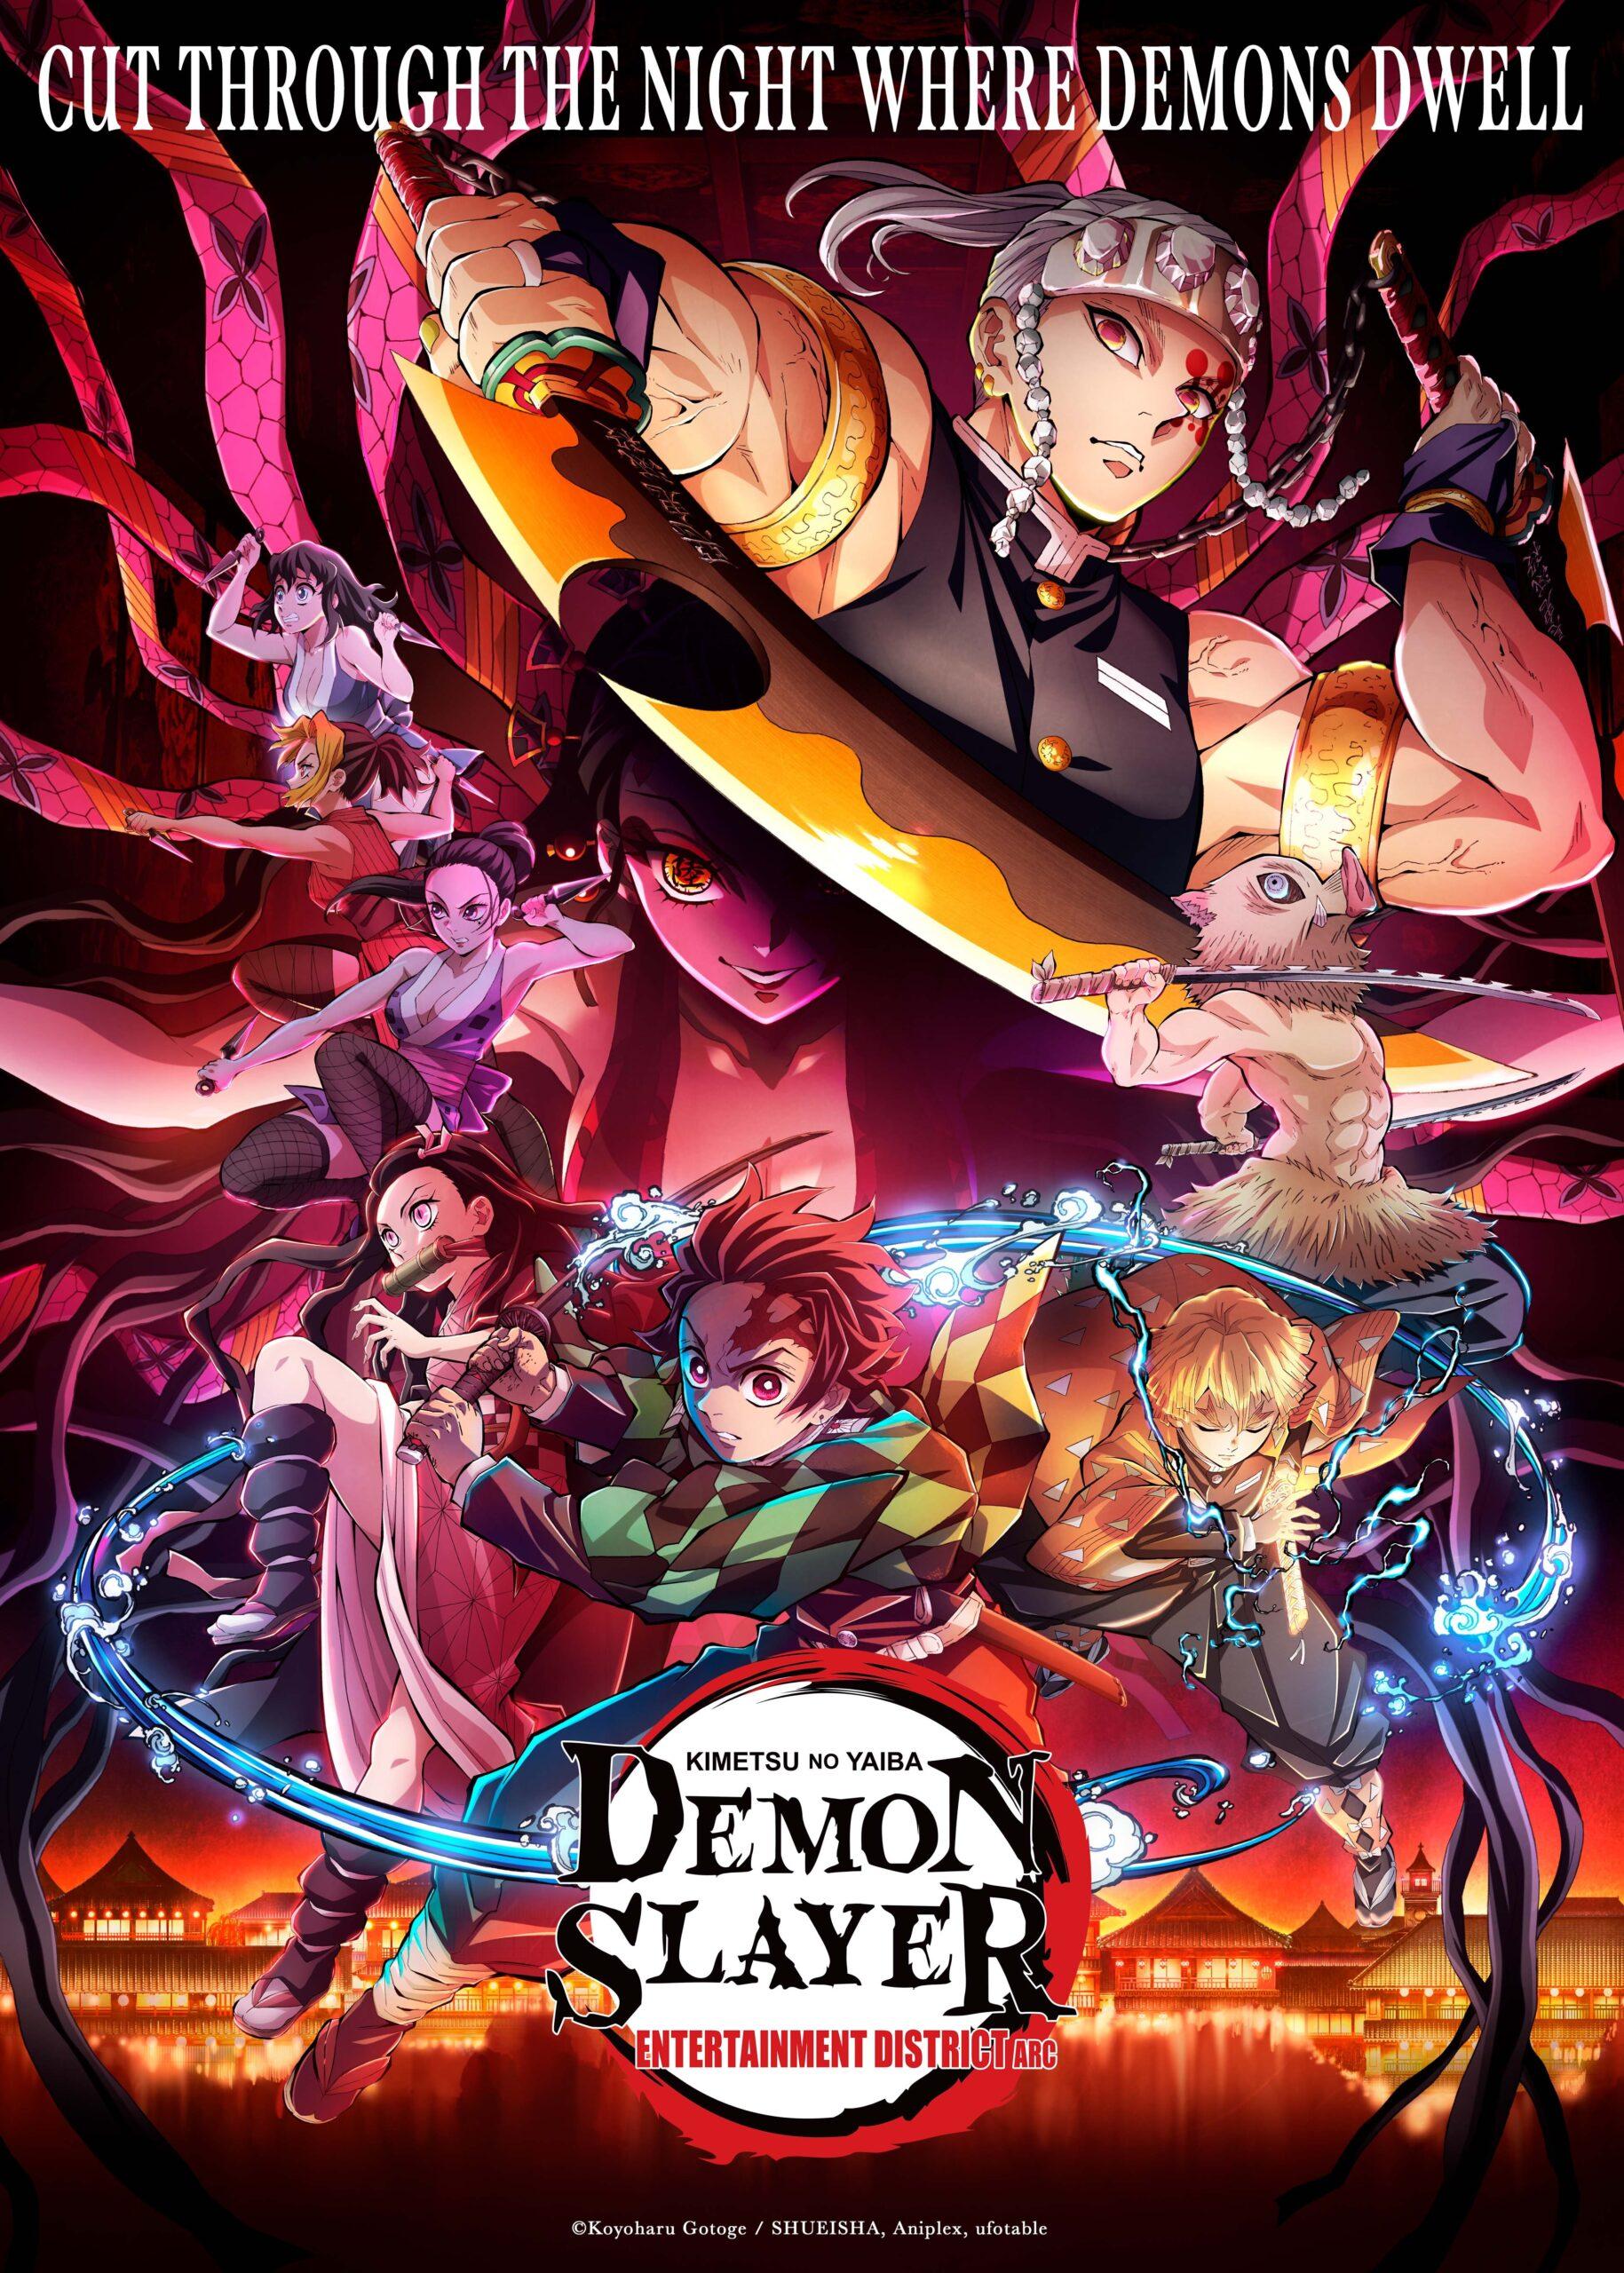 Demon Slayer_ Kimetsu no Yaiba Entertainment District Arc KV